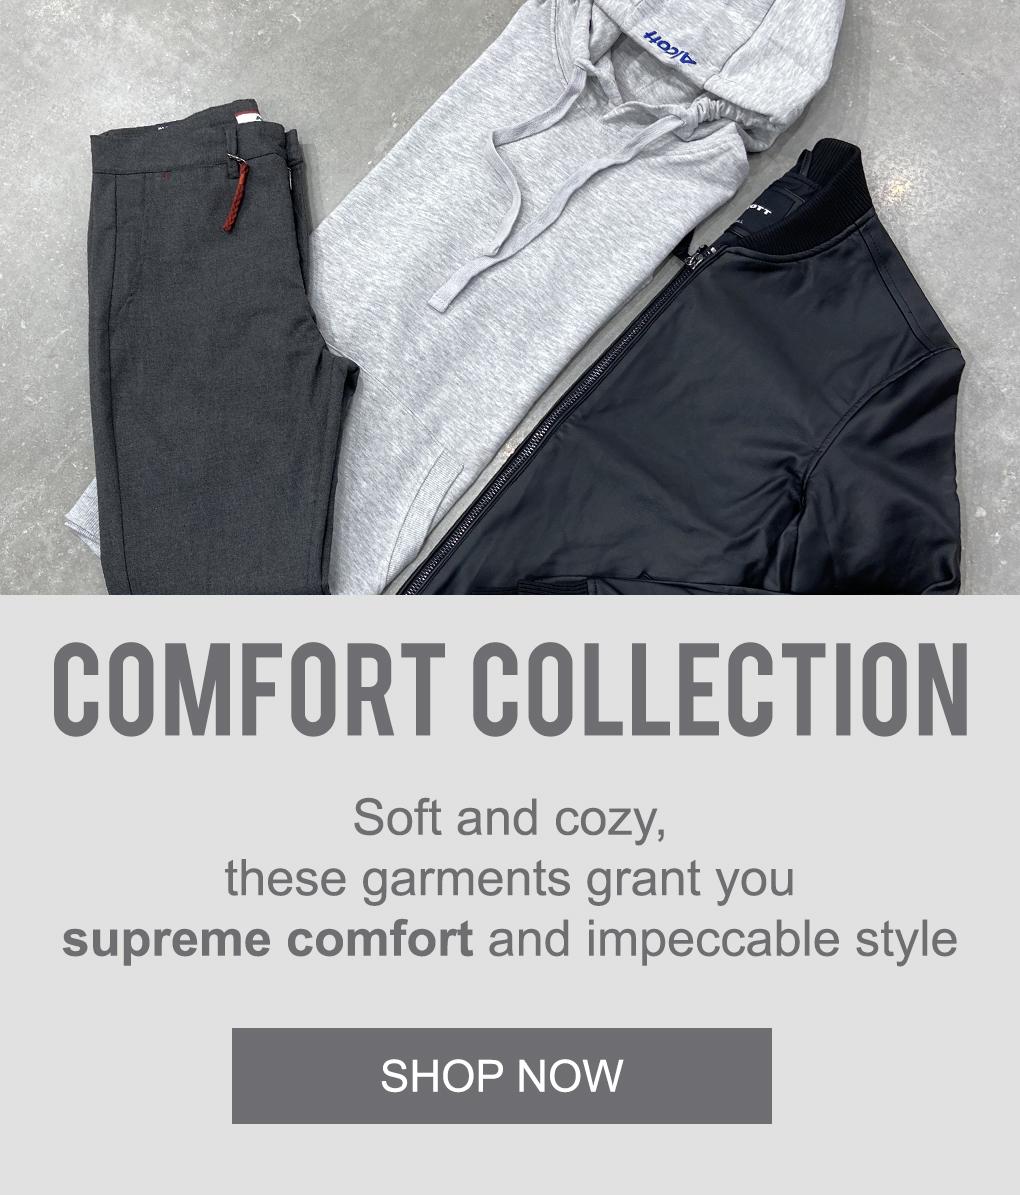 men-clothing-comfort